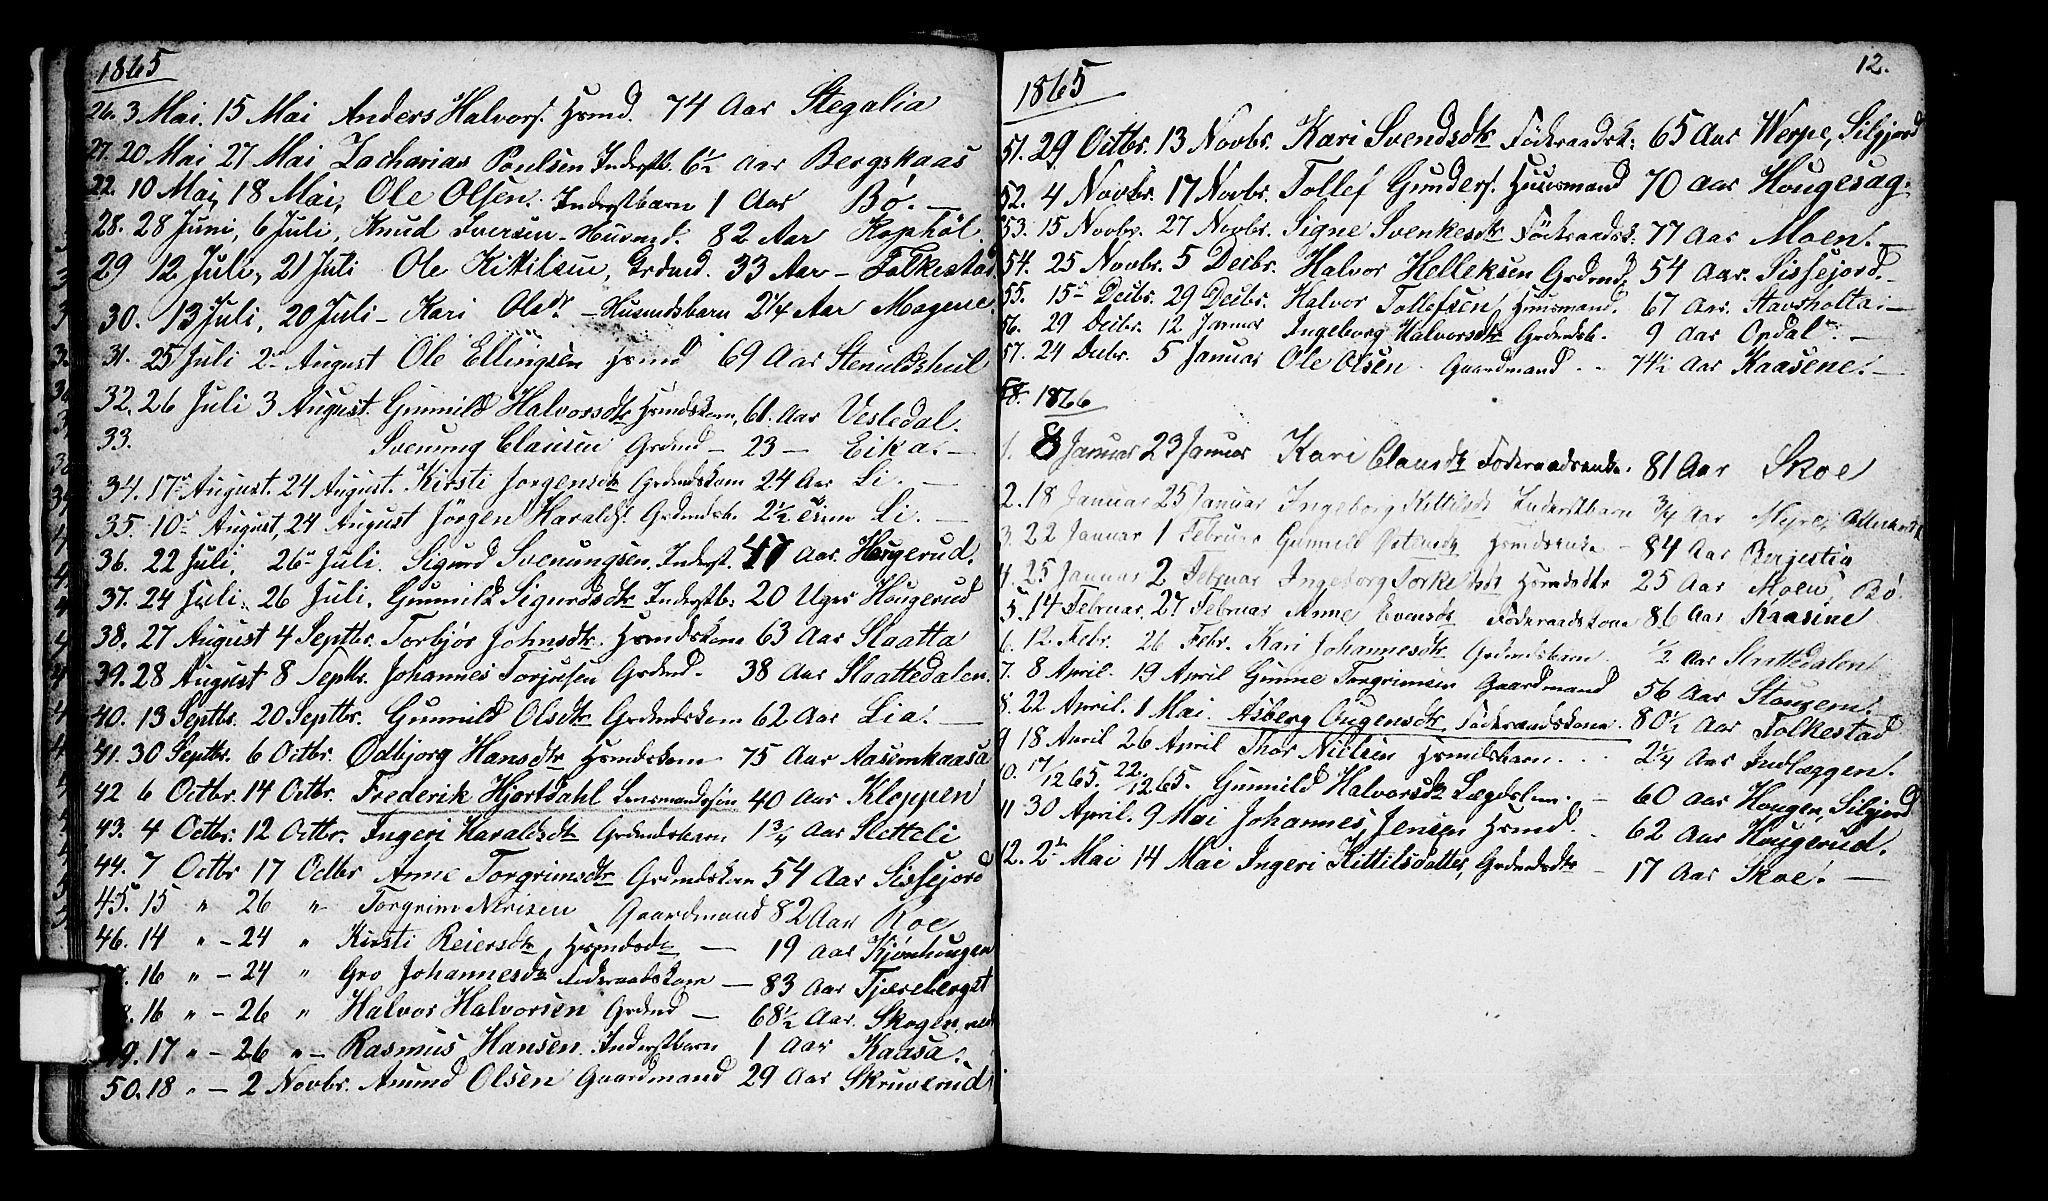 SAKO, Bø kirkebøker, G/Ga/L0002: Klokkerbok nr. 2, 1853-1866, s. 12